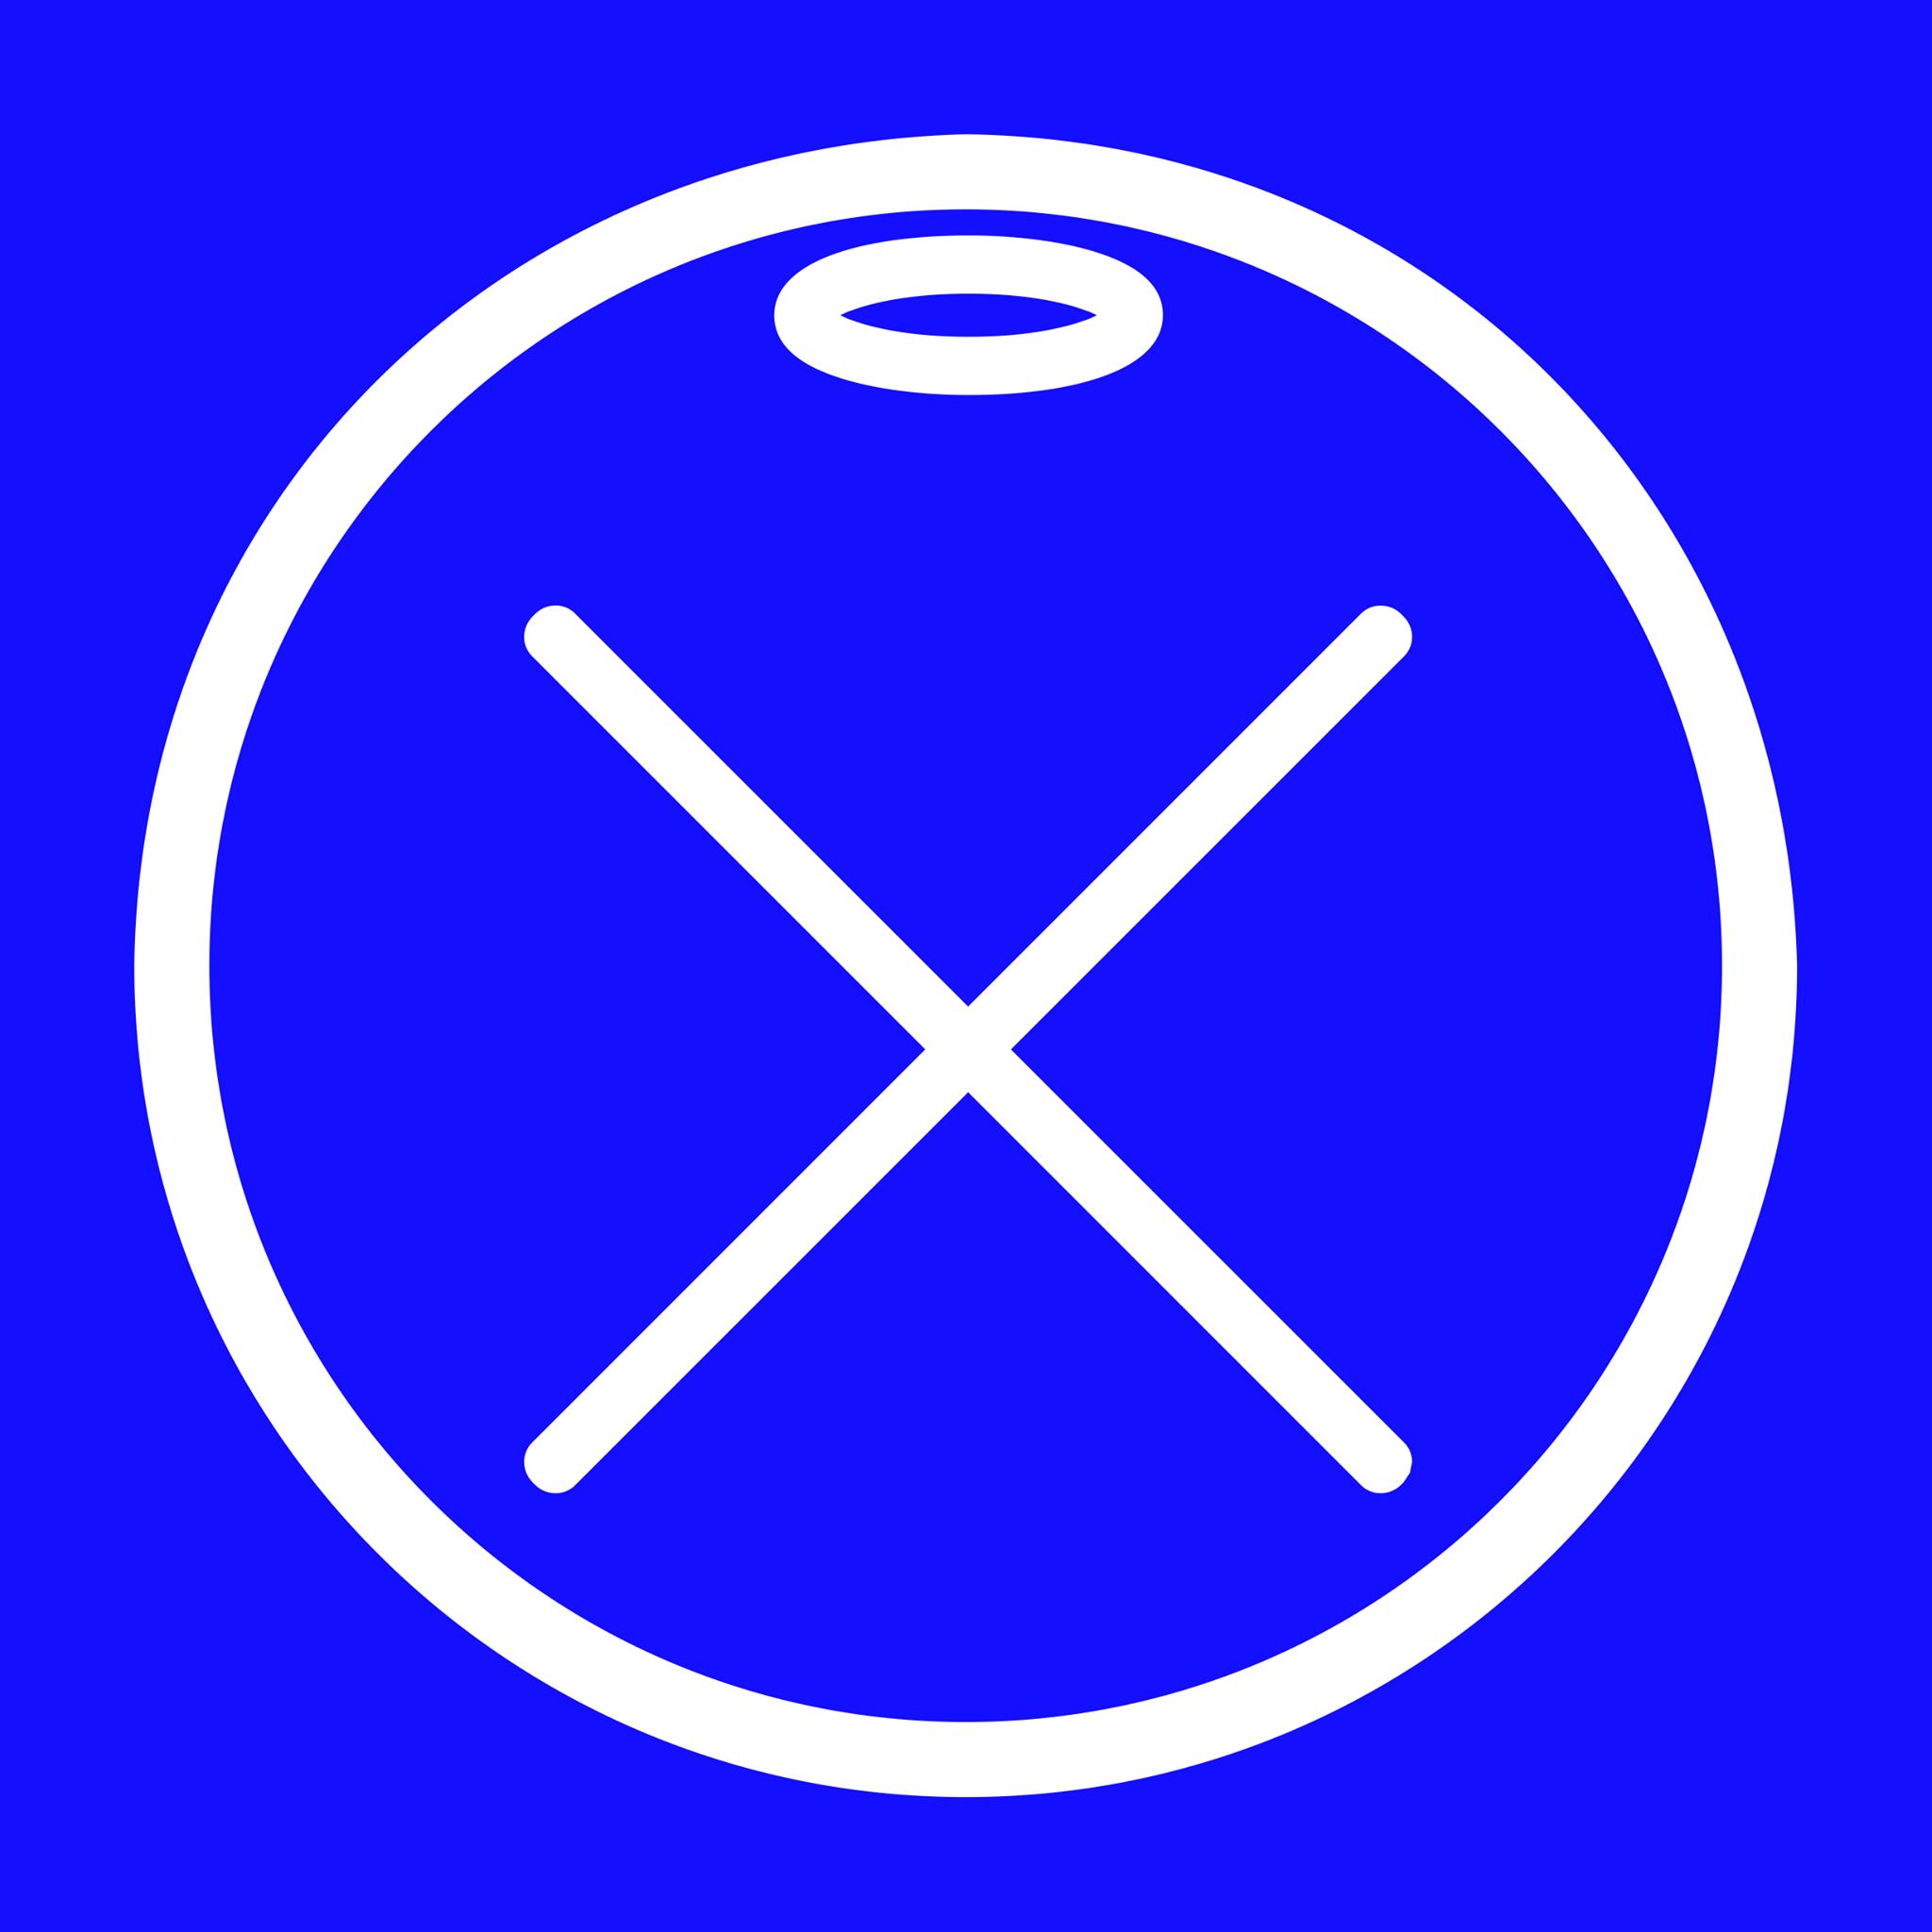 Holypopstore logo